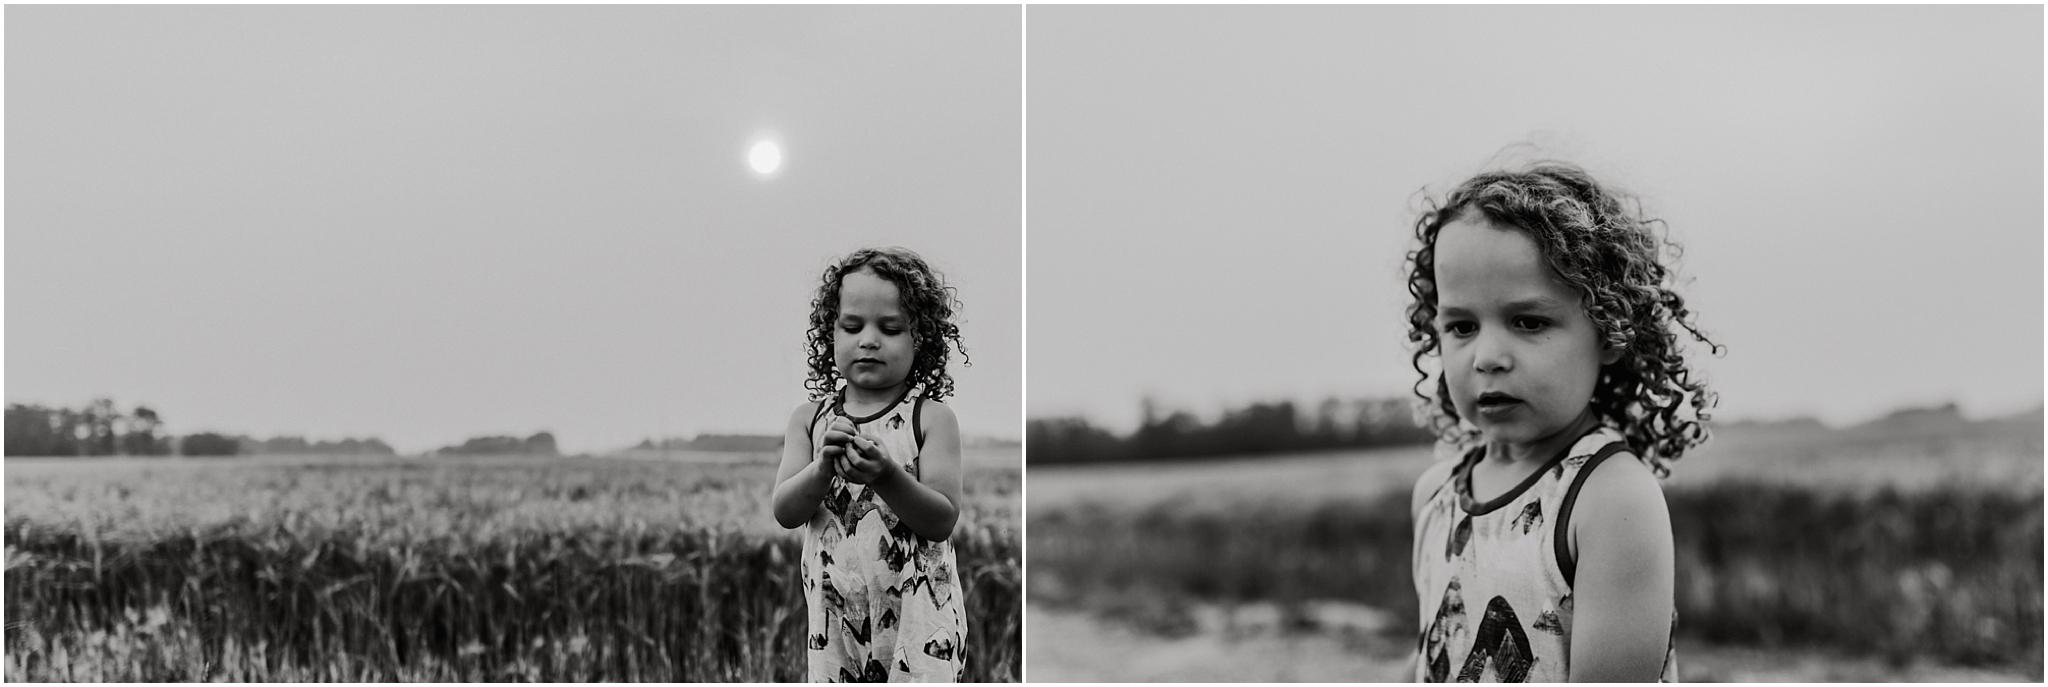 Treelines Photography - Edmonton Lifestyle Photographer - Alberta Skies - August 2018